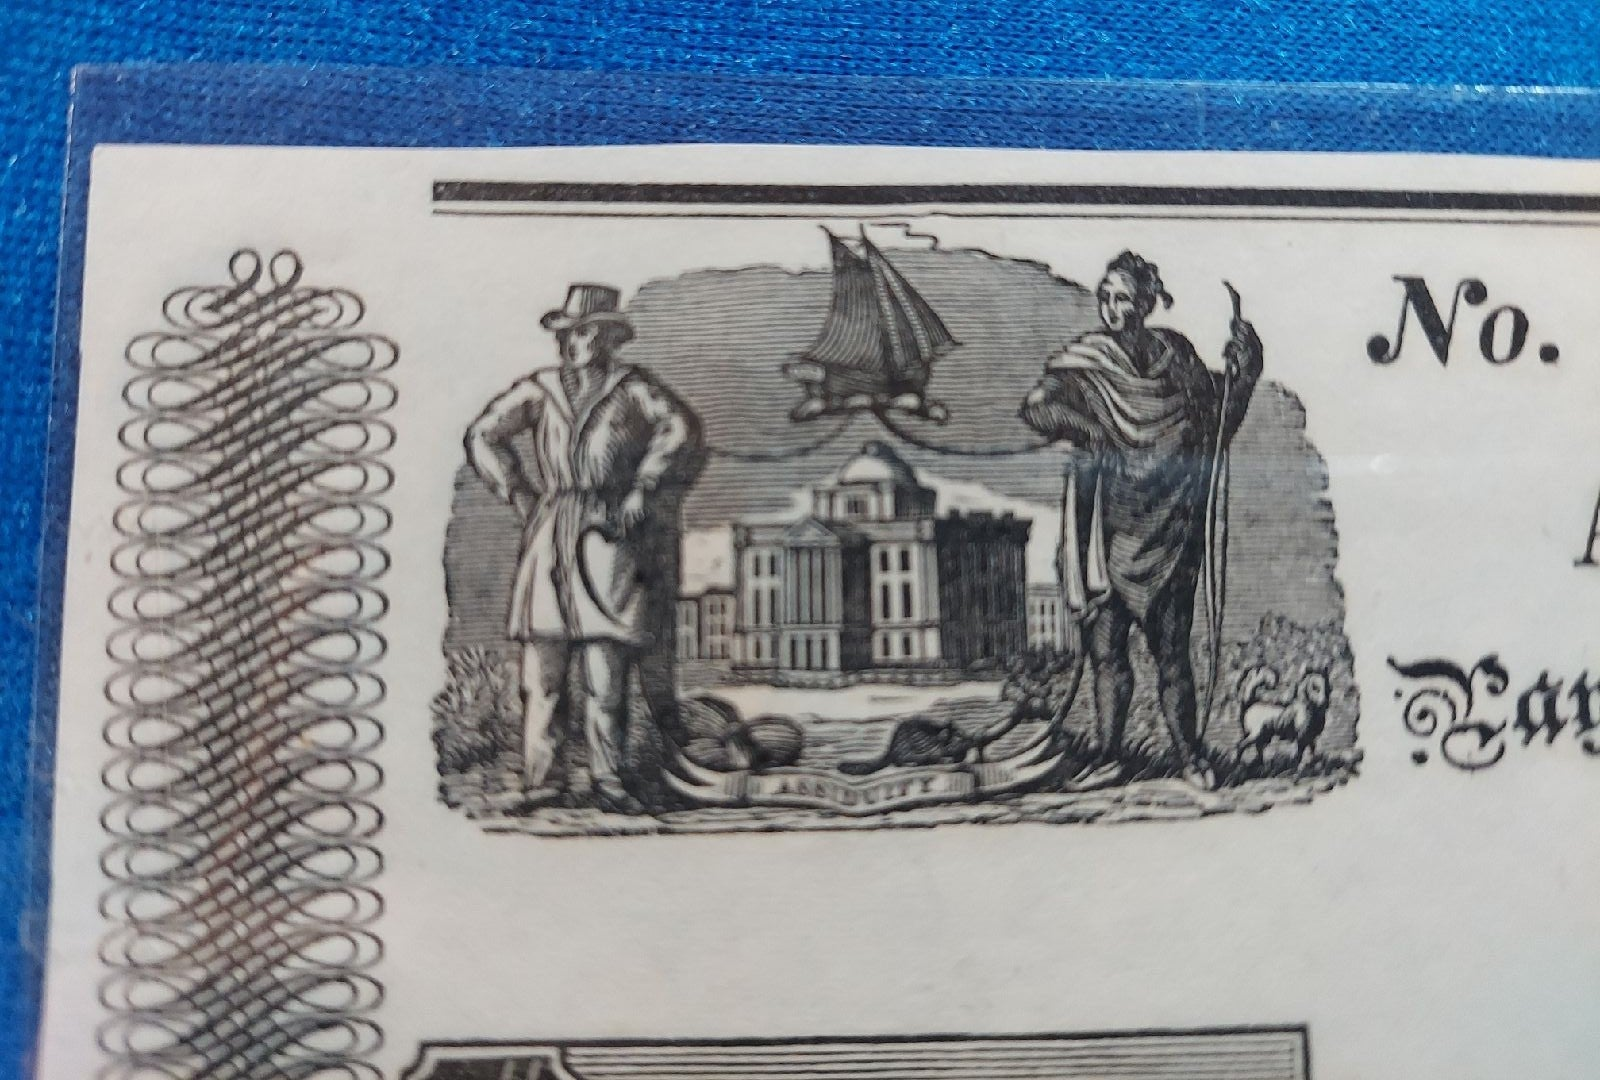 RARE Paper money, Unc. Early 1840's